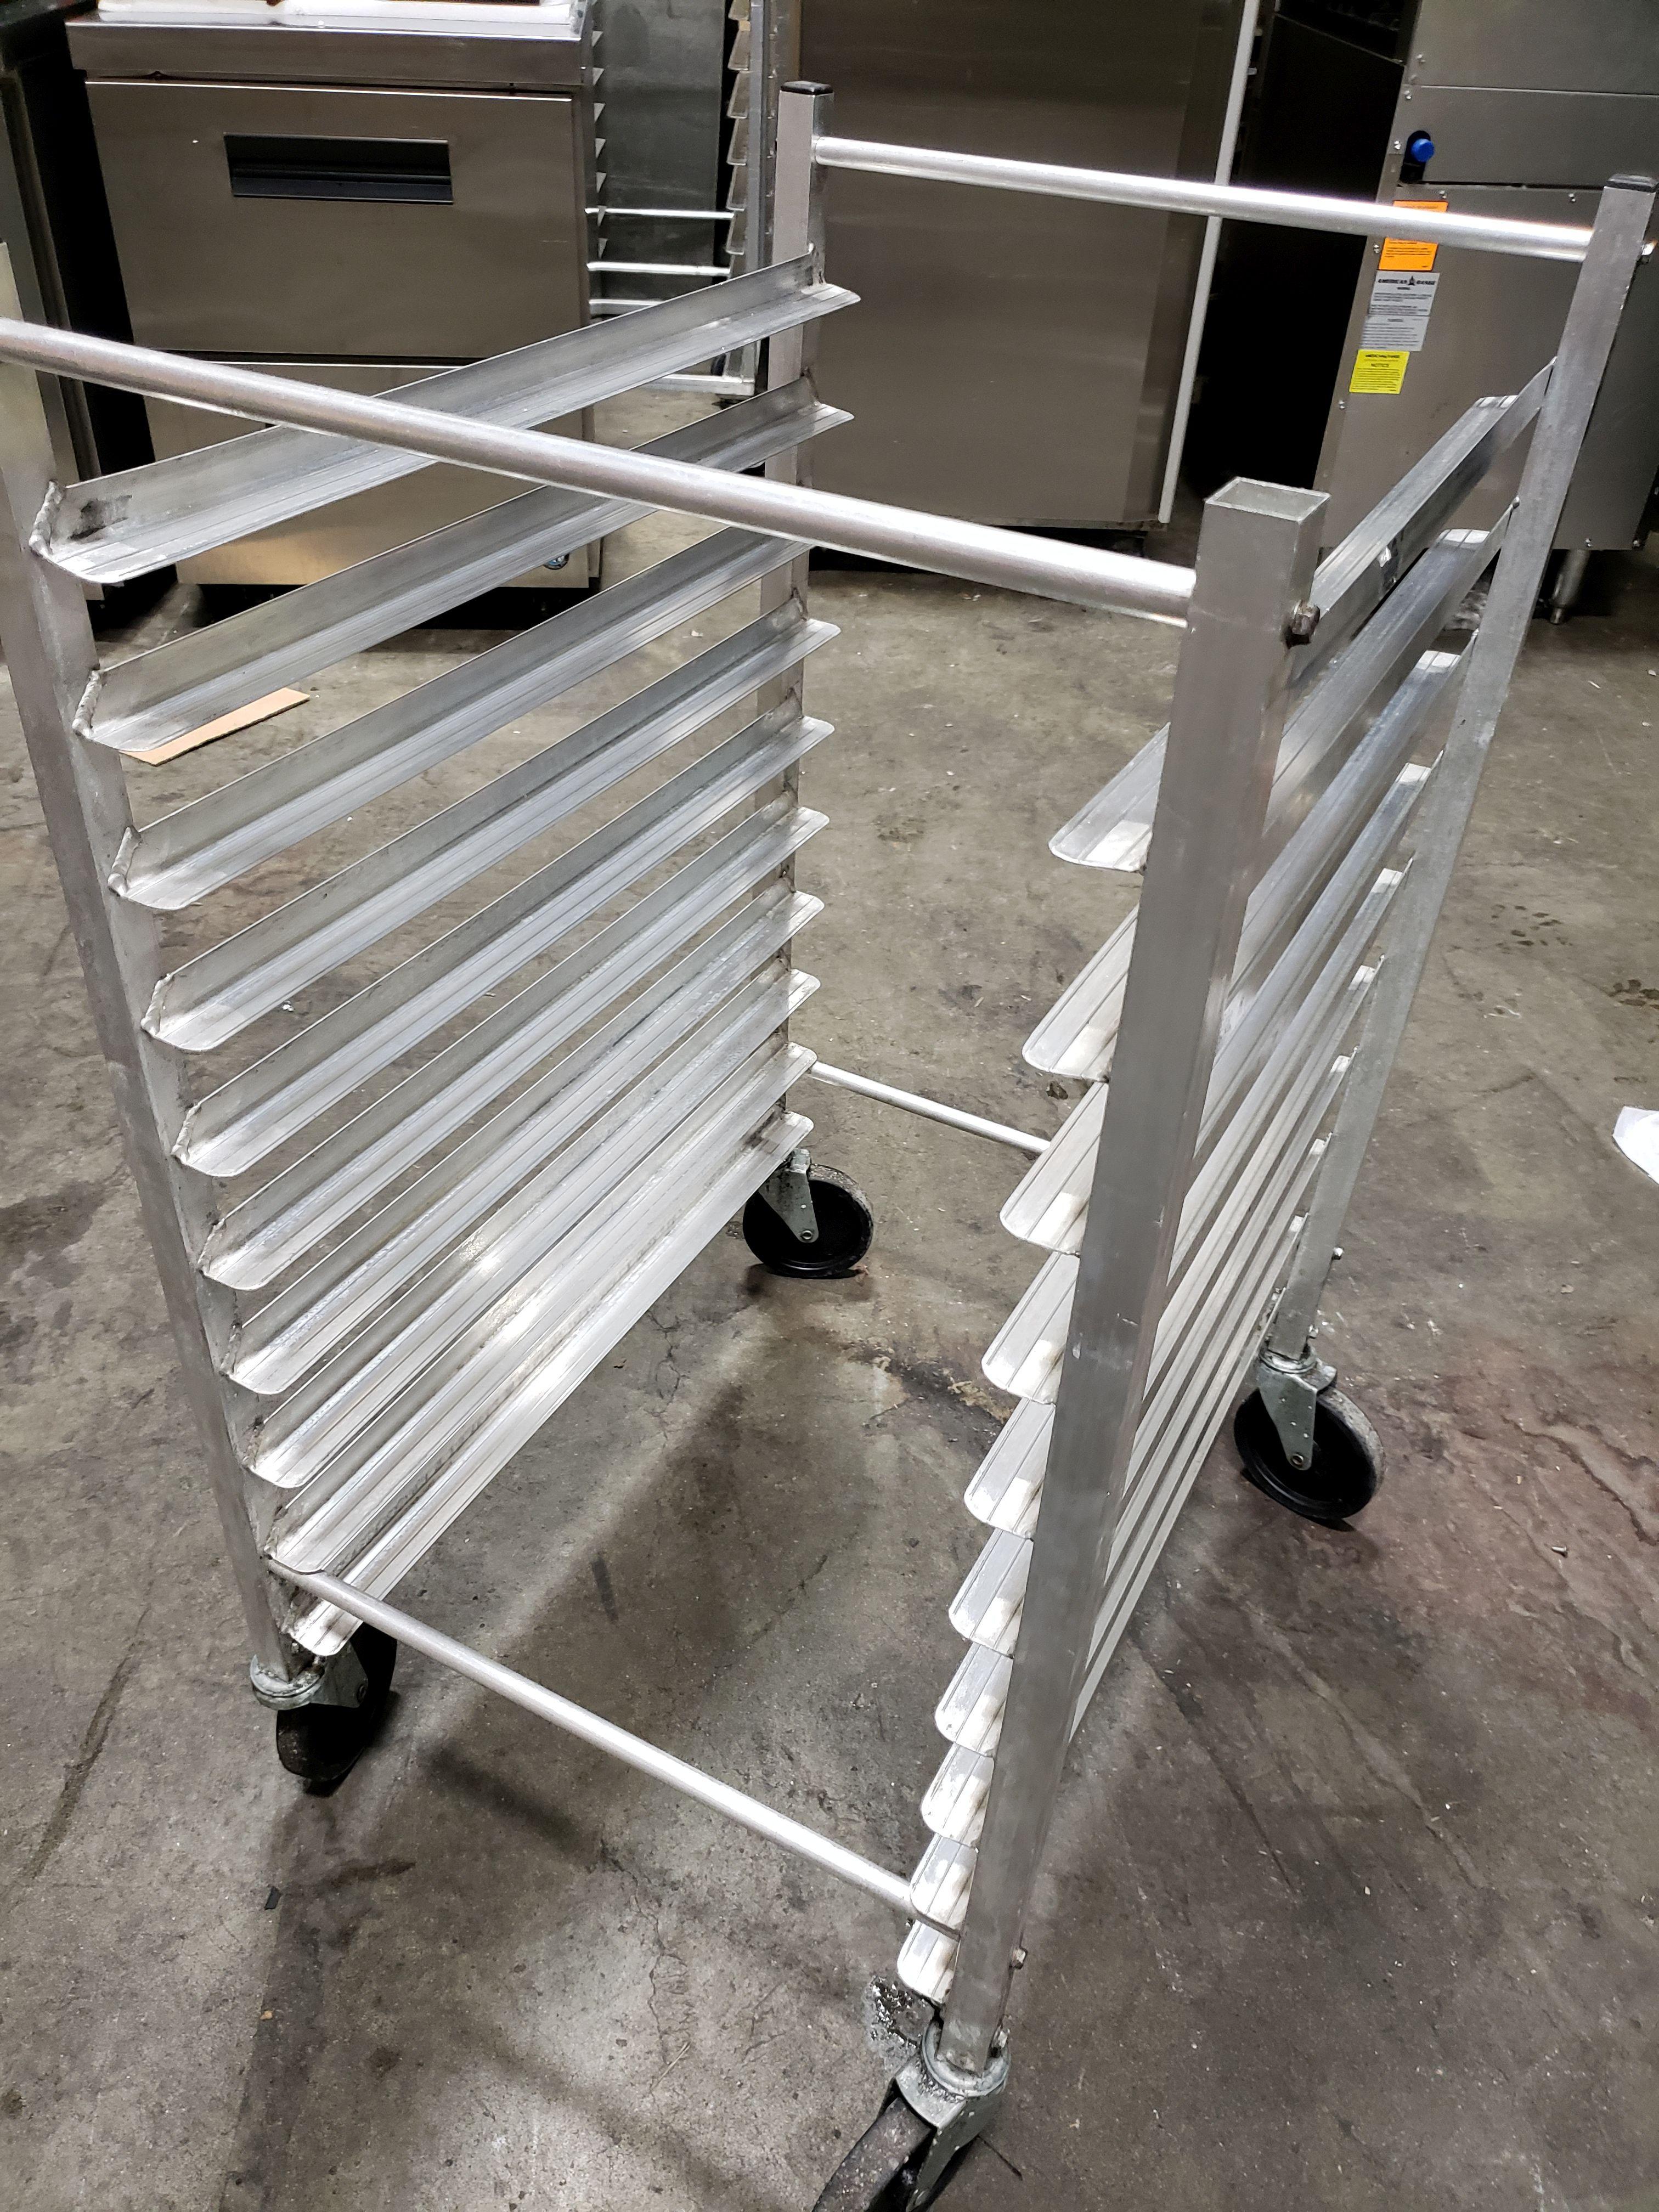 Lot 32 - Aluminum 10 Pan Sheet Pan Rack on Casters - Advance Tabco